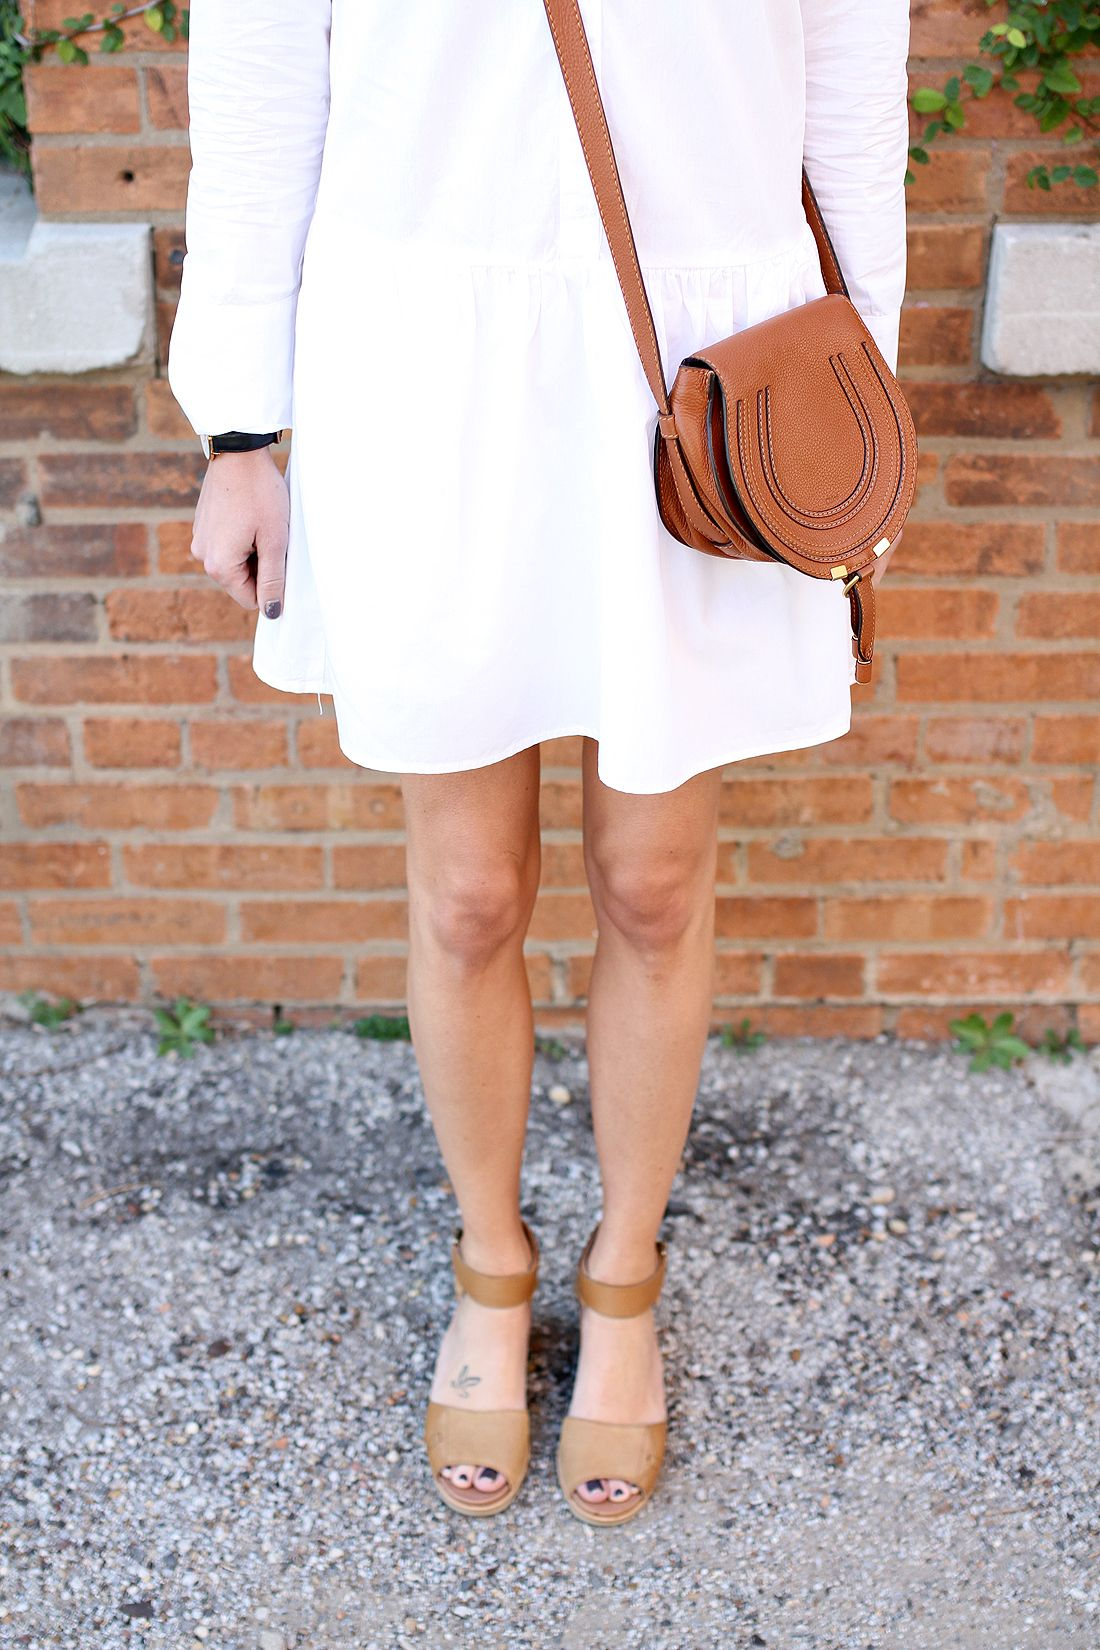 d359b6693d81 fashion-jackson-chloe-marcie-tan-crossbody-sorel-joanie-sandals-white-shirtdress   sorelfootwear  chloefashion  splendidla